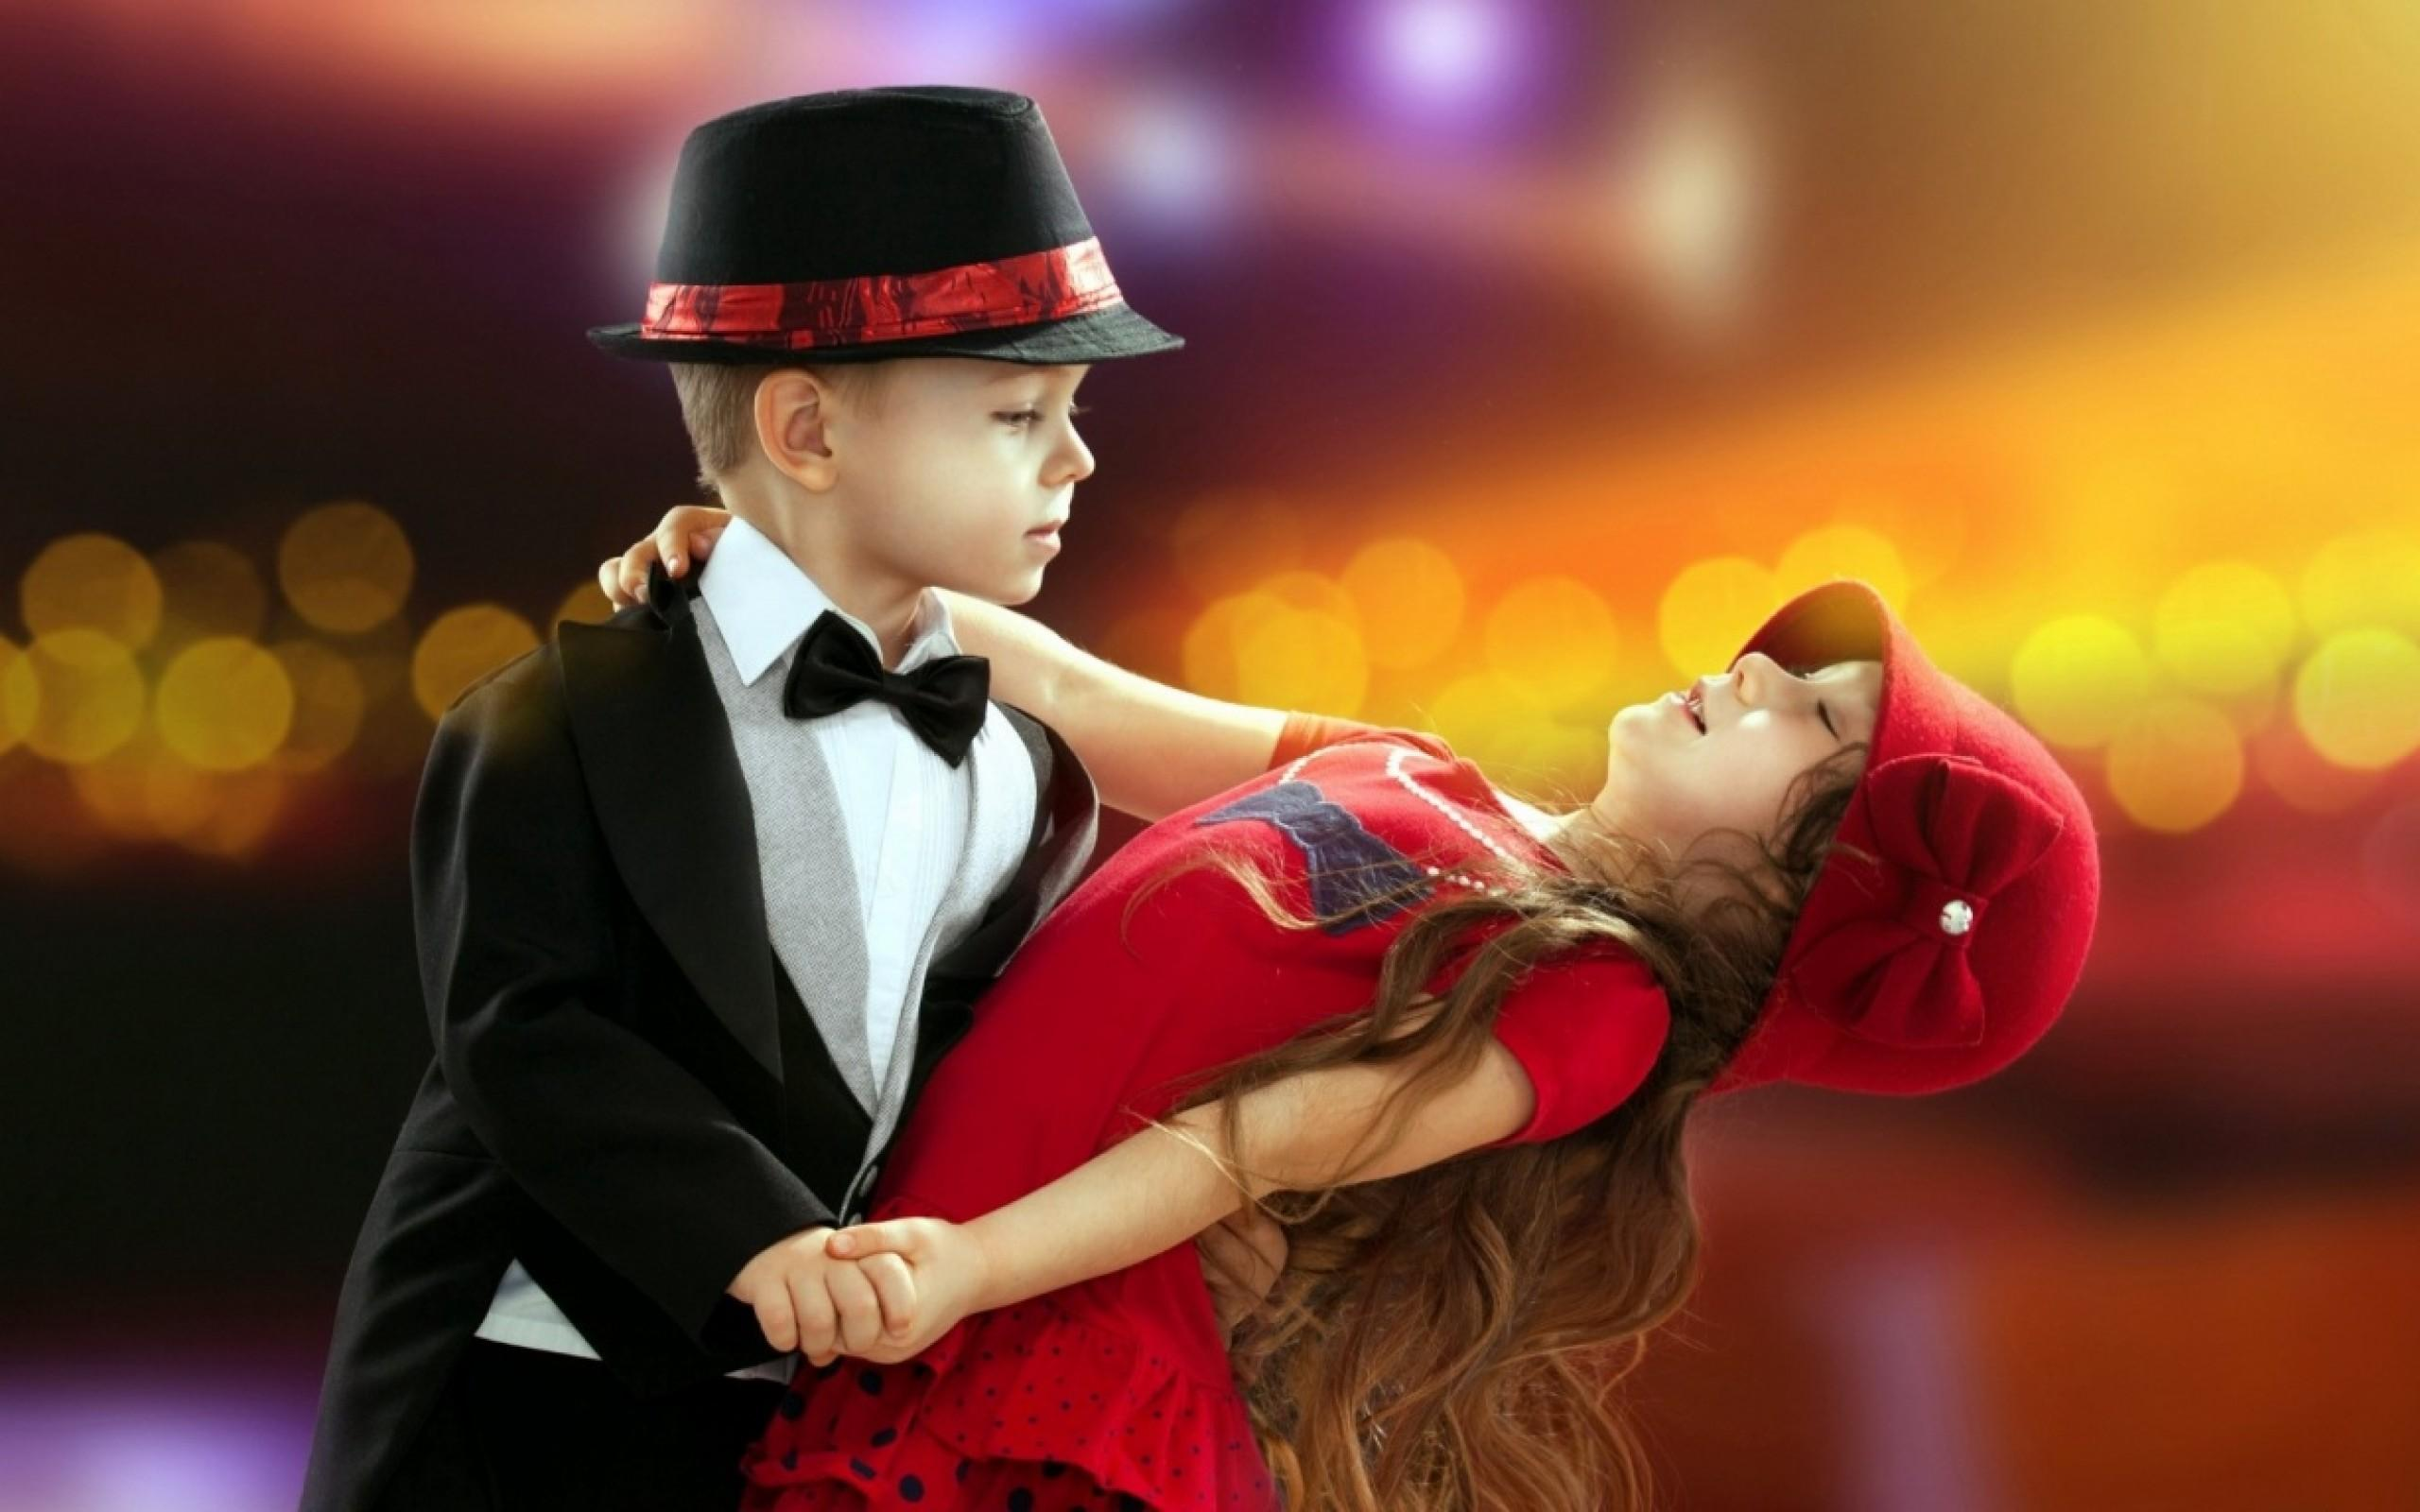 Lovely Boys And Girls - HD Wallpaper